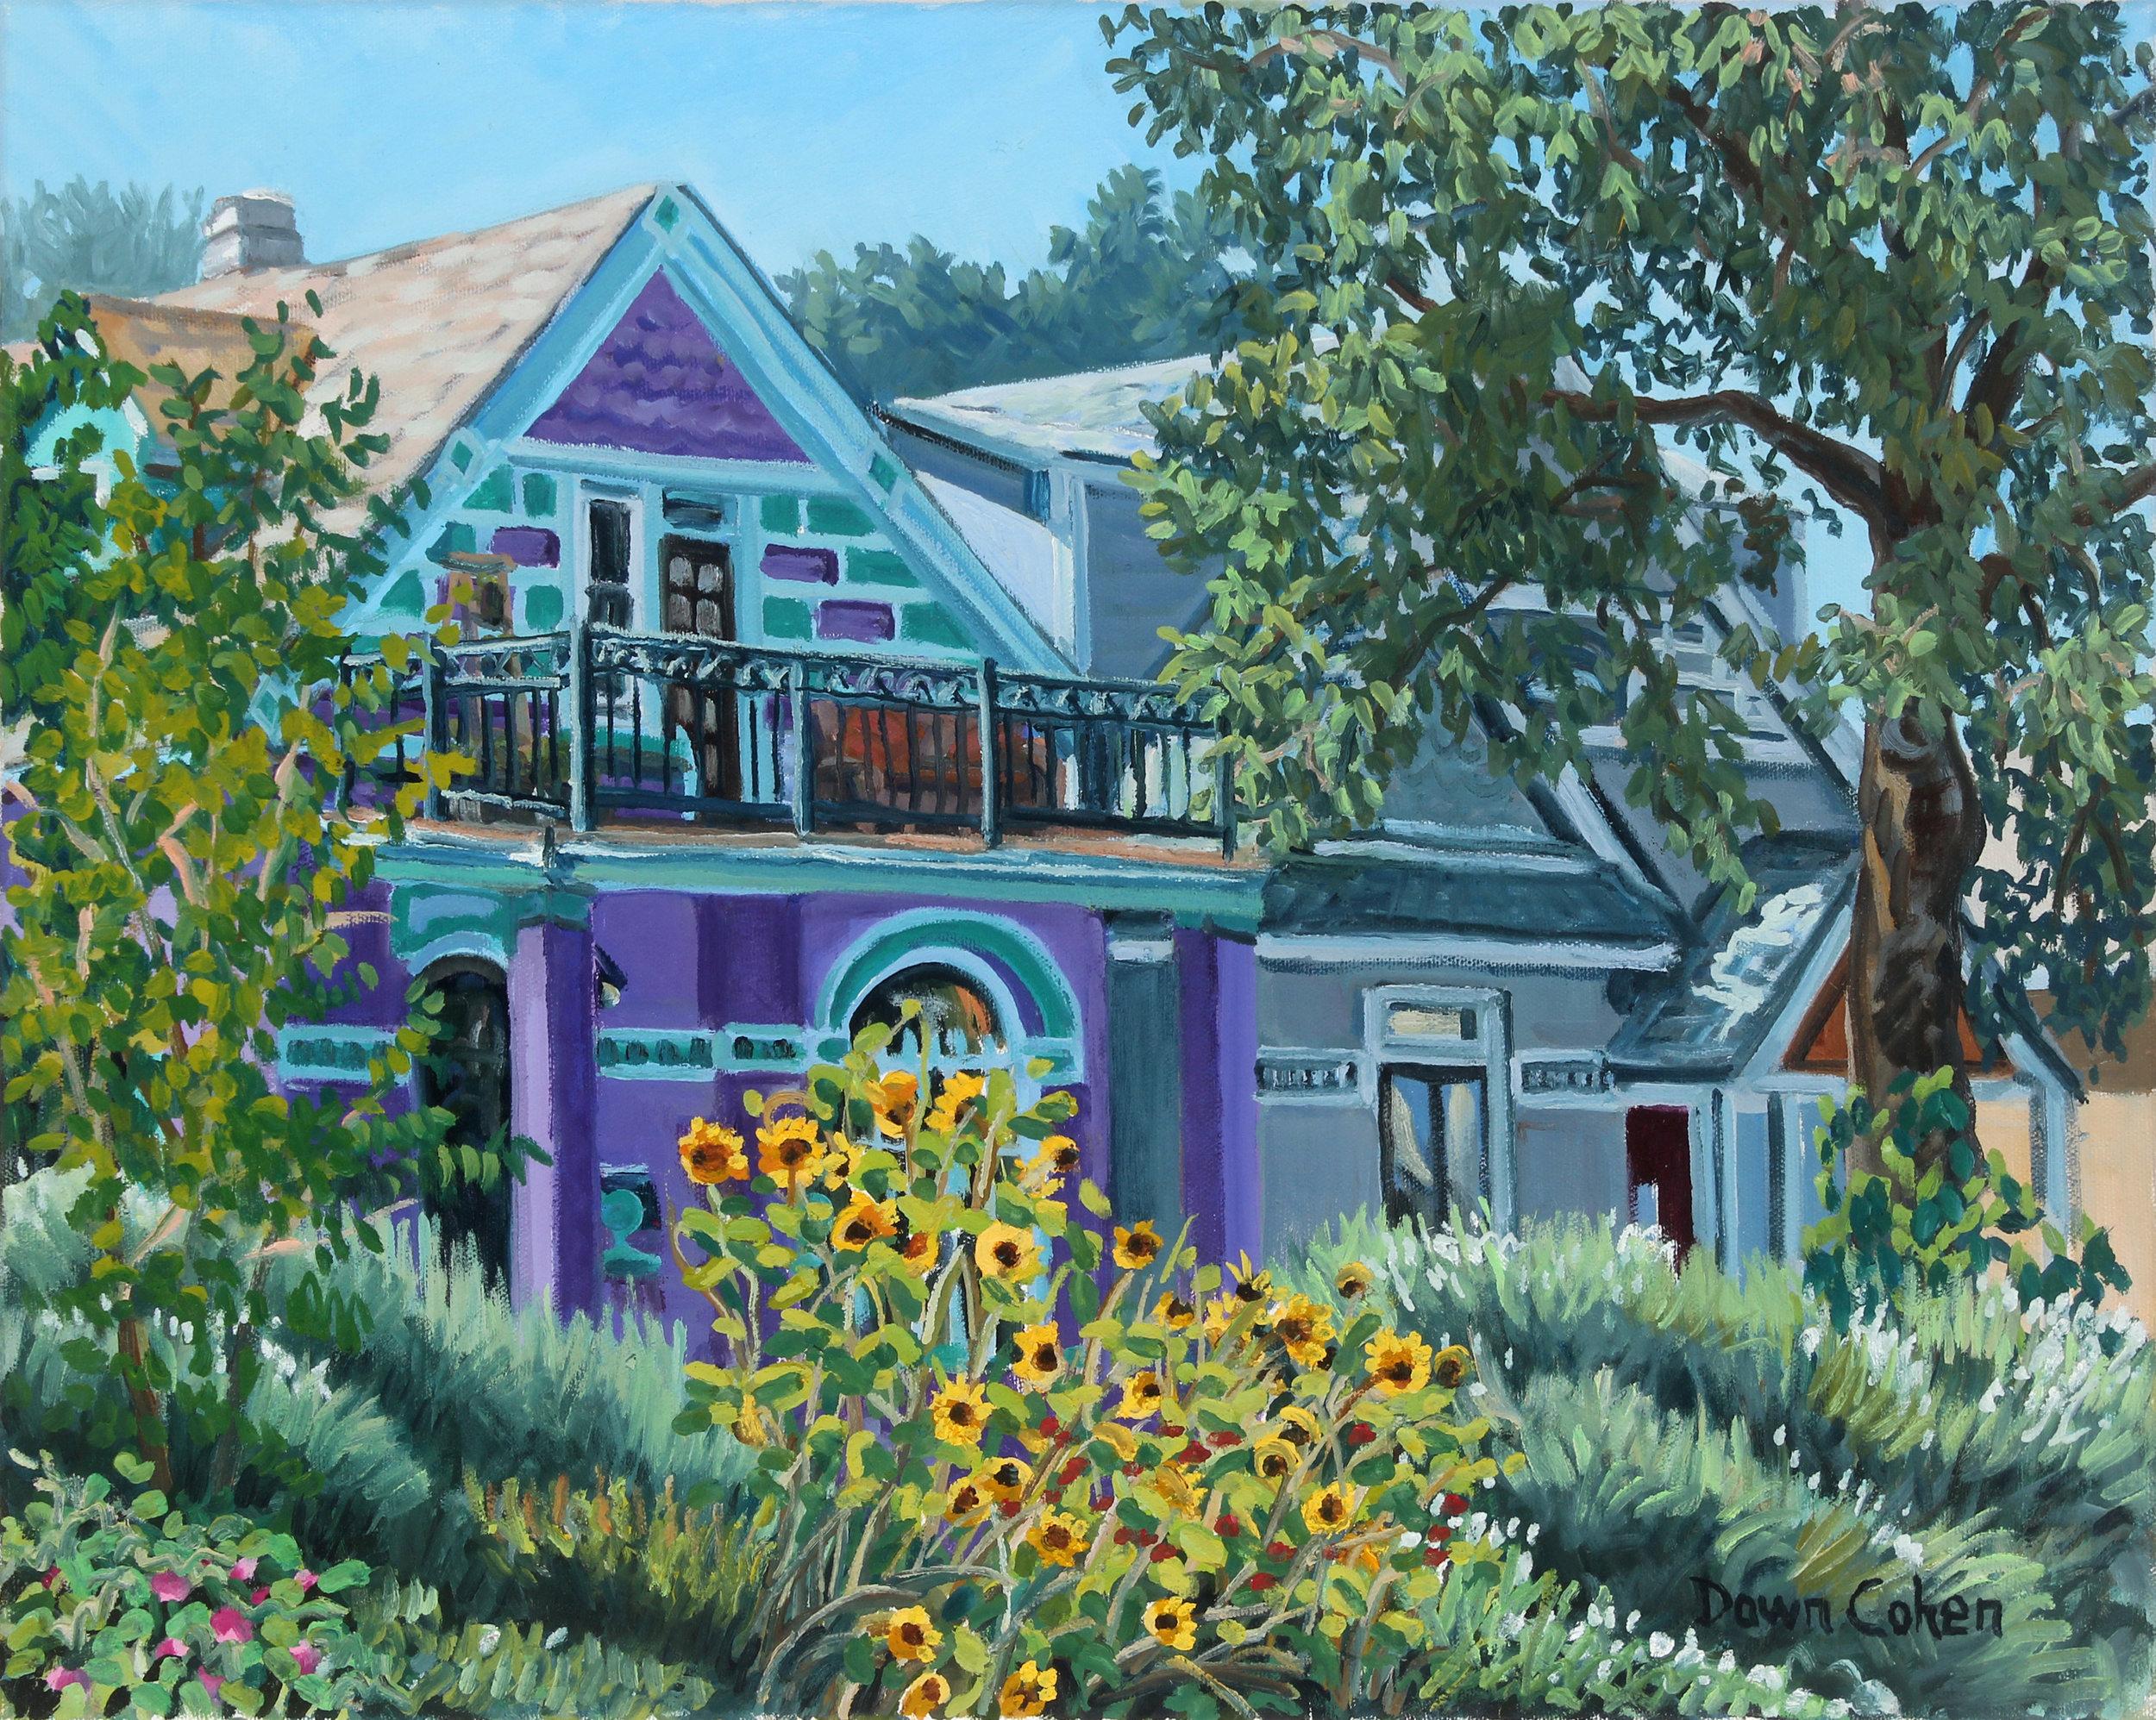 Neighborhood Home, 2017. Oil on canvas; 20 x 16 in.